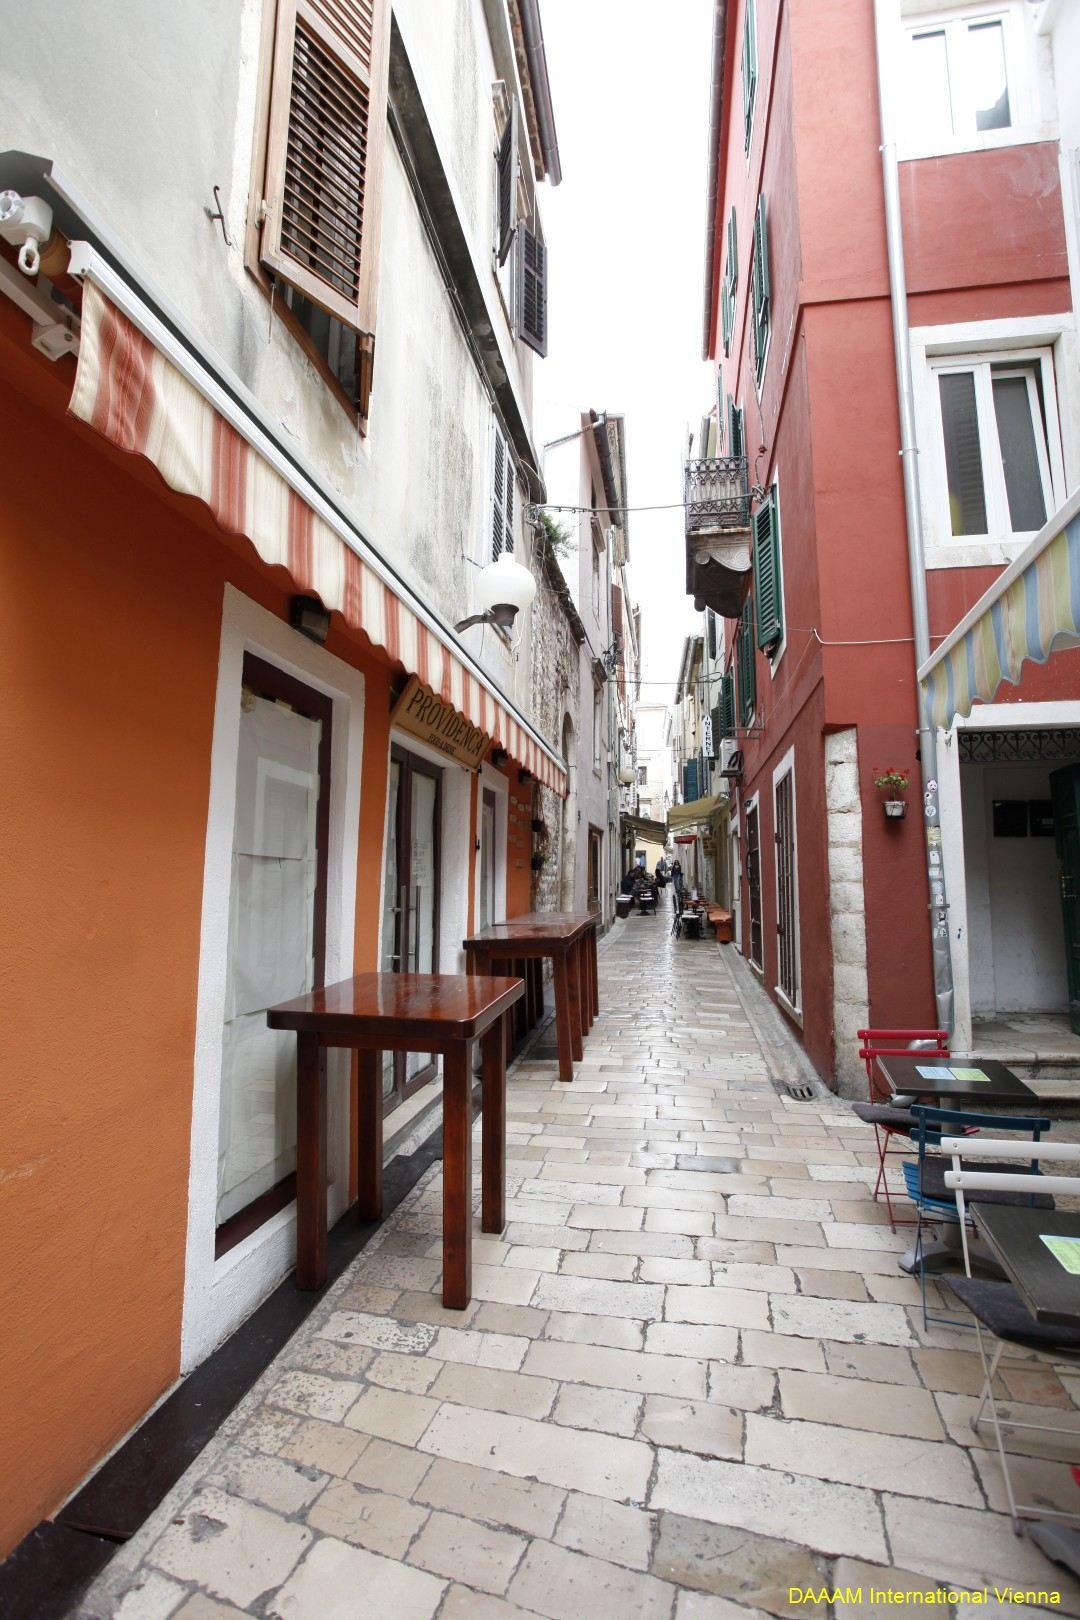 DAAAM_2012_Zadar_00_Zadar_City_021